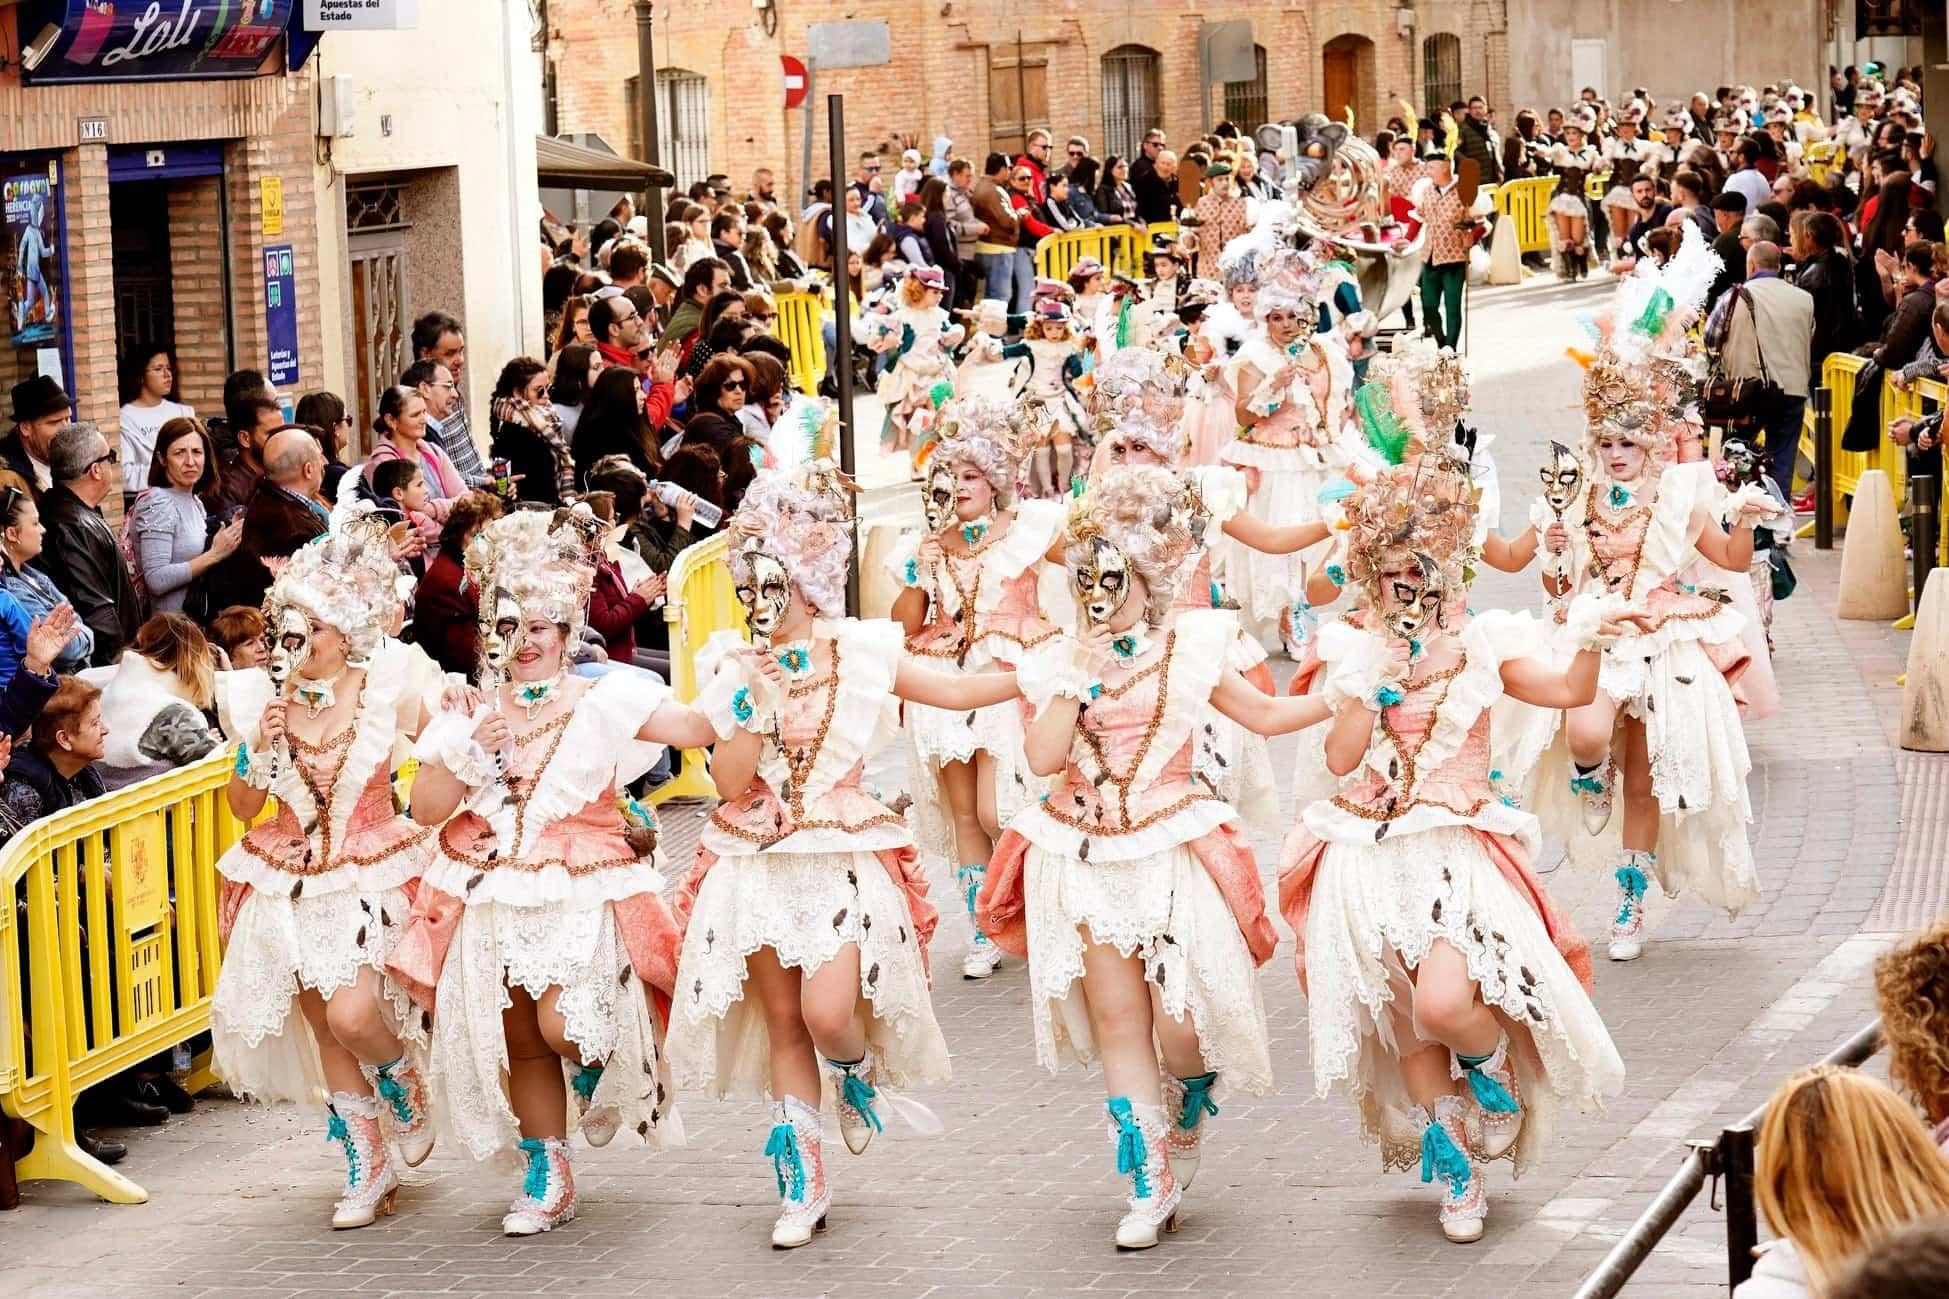 Carnaval de herencia 2020 ofertorio 75 - Selección de fotografías del Ofertorio del Carnaval de Herencia